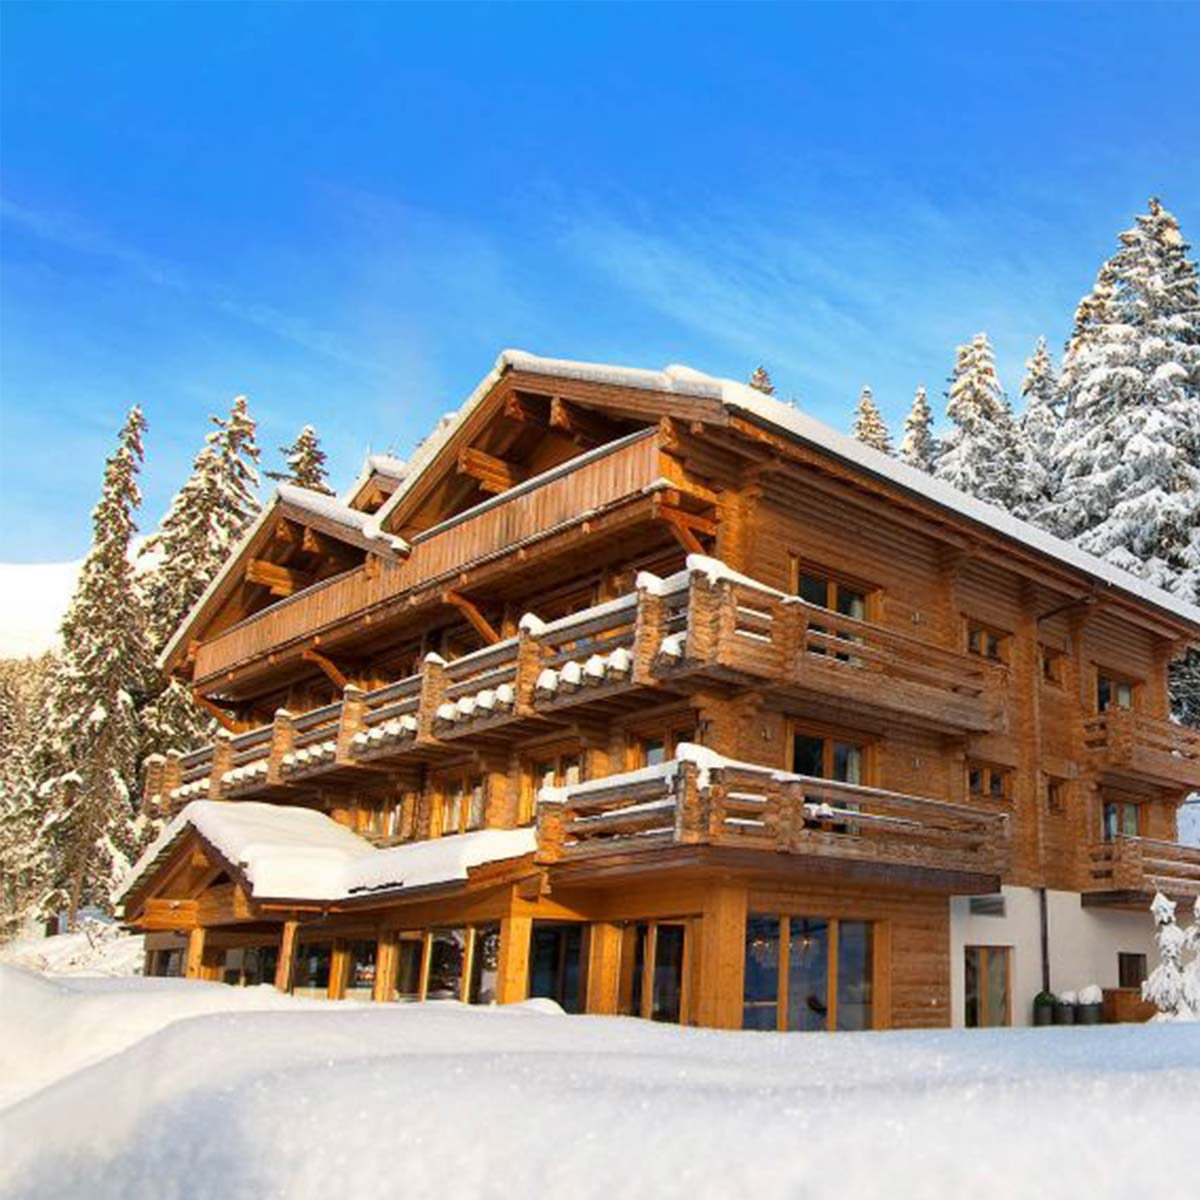 Best Ski Resorts & Hotels in Europe